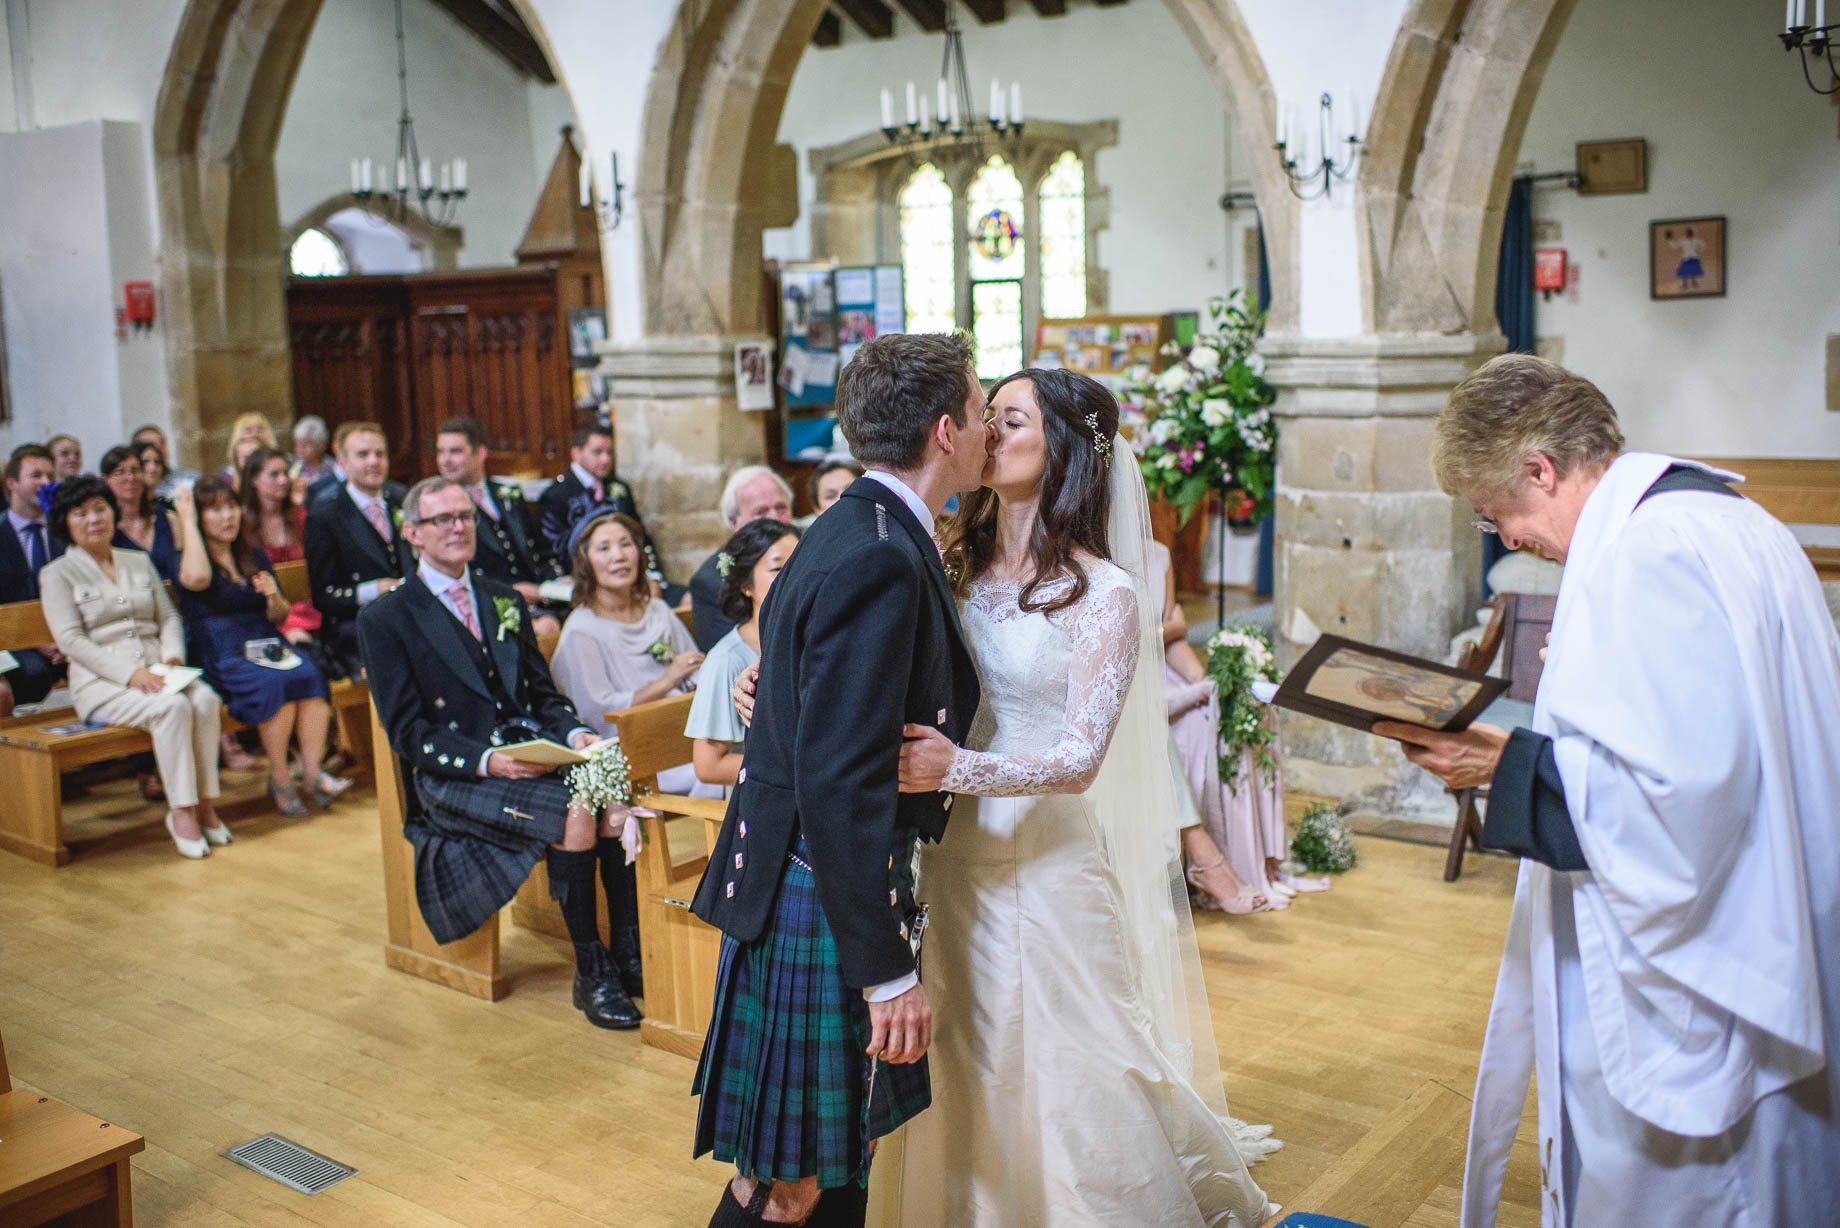 Gildings Barn wedding photography - Sarah and Steve (52 of 190)